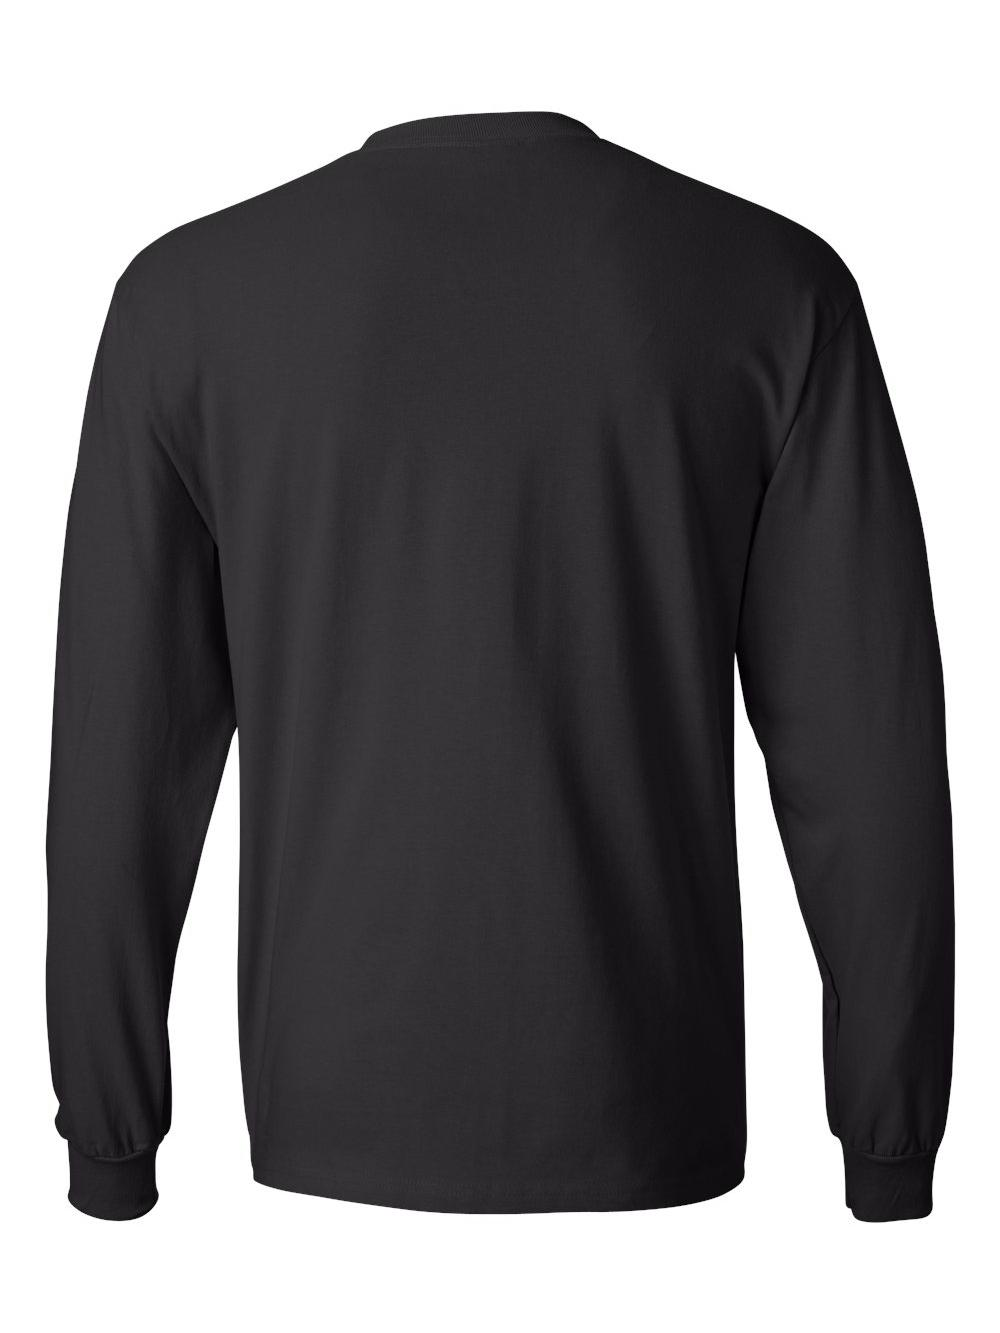 Hanes-Beefy-T-Long-Sleeve-T-Shirt-5186 thumbnail 7